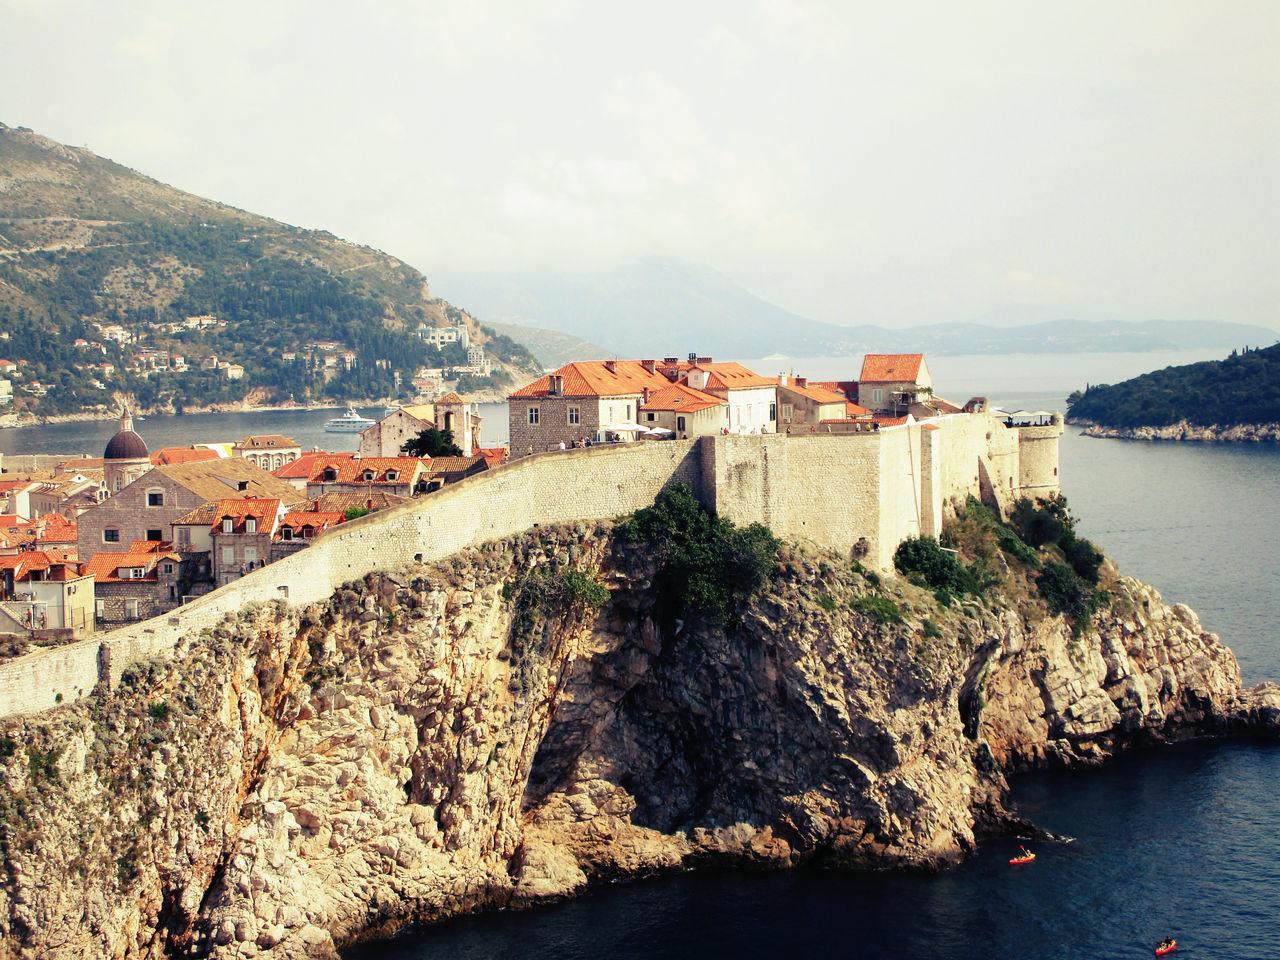 Adriatic Coast Adriatic Sea City CityWalk Croatia Dubrovnik# EyeEm Hello World Holiday Sunset Travel Unique